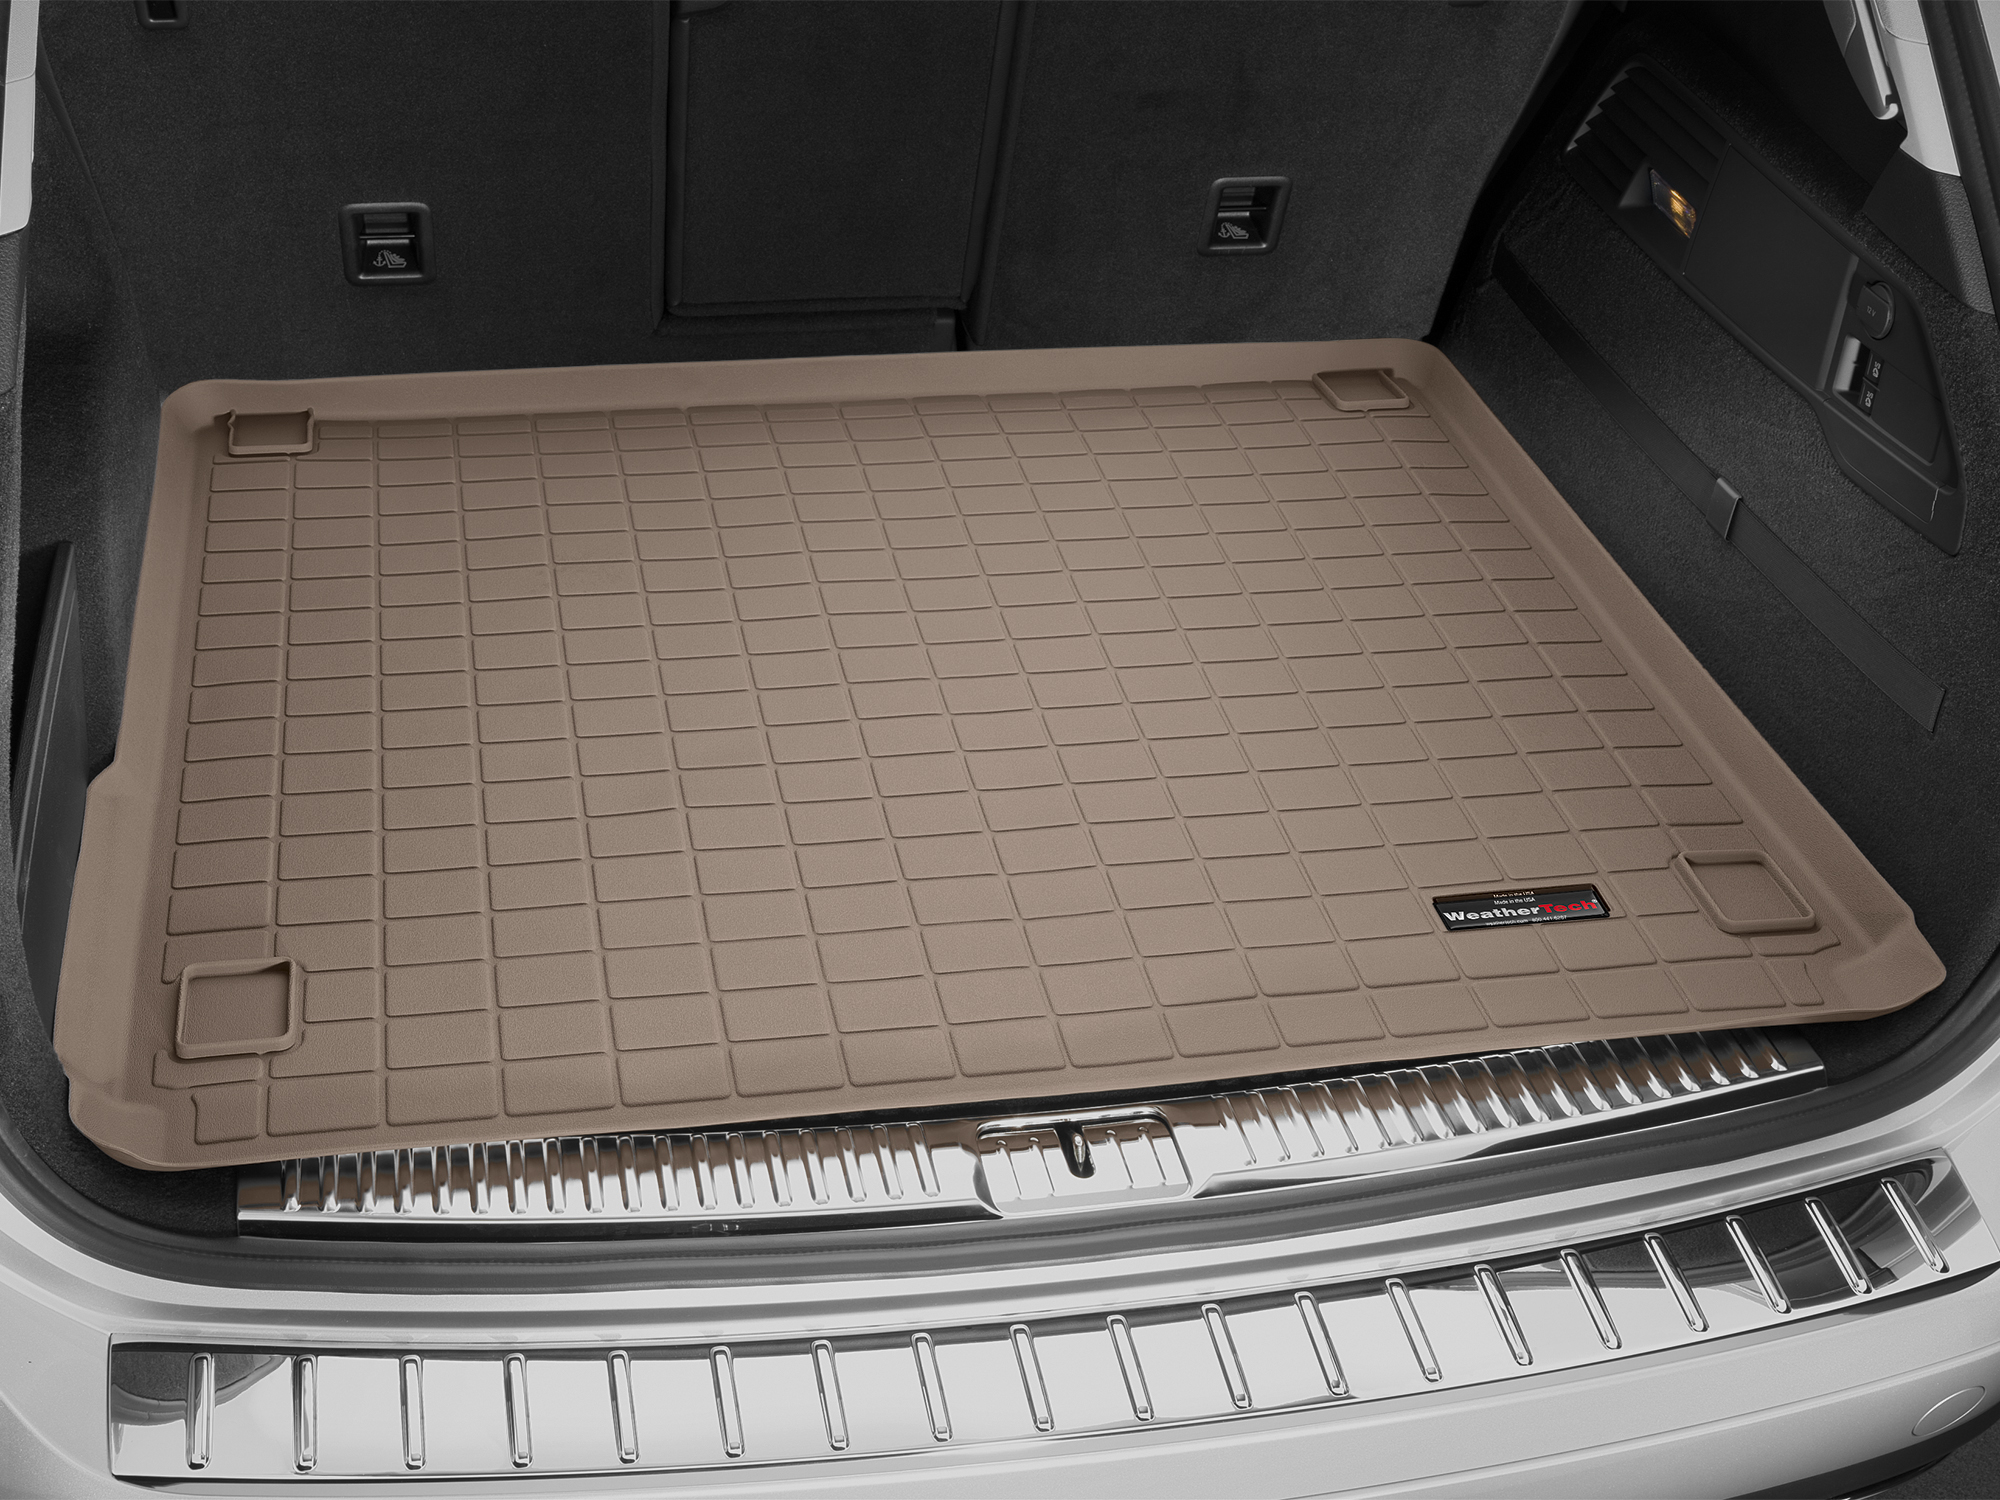 Volkswagen Touareg 2010>2010 Vasca baule tappeto bagagliaio marrone *1432